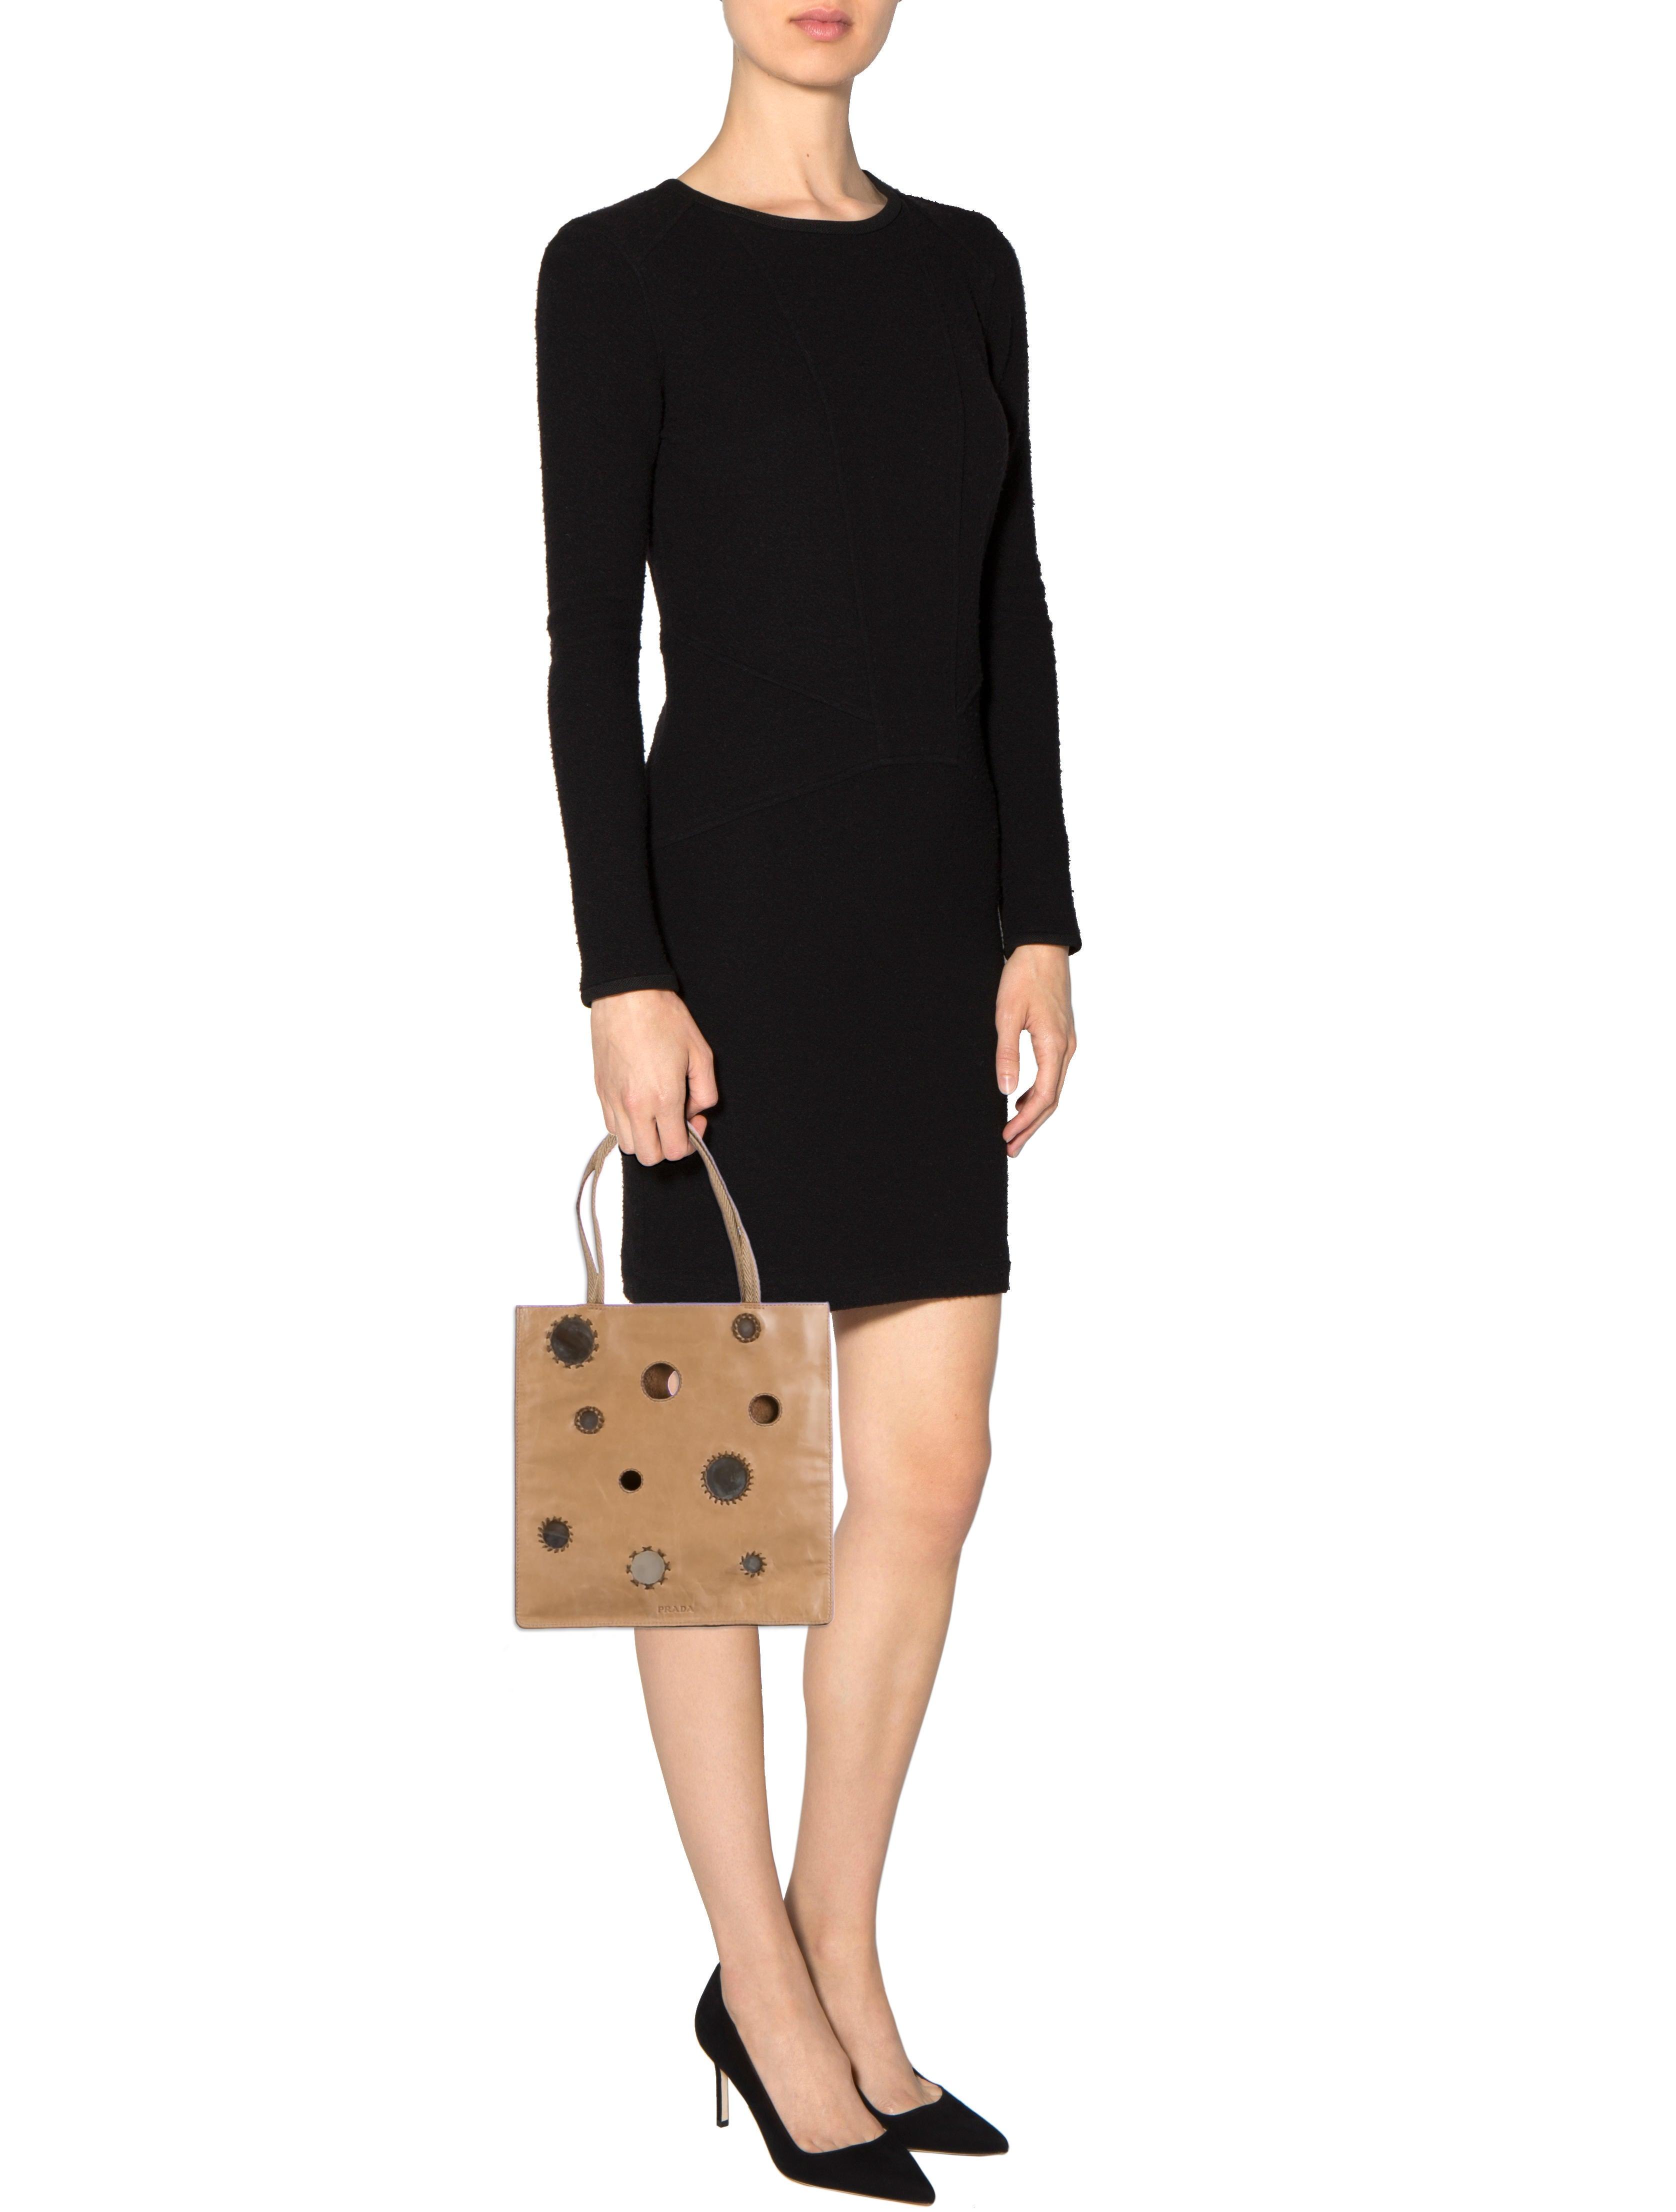 prada vela nylon tote - Prada Leather Reflective Handle Bag - Handbags - PRA83133 | The ...